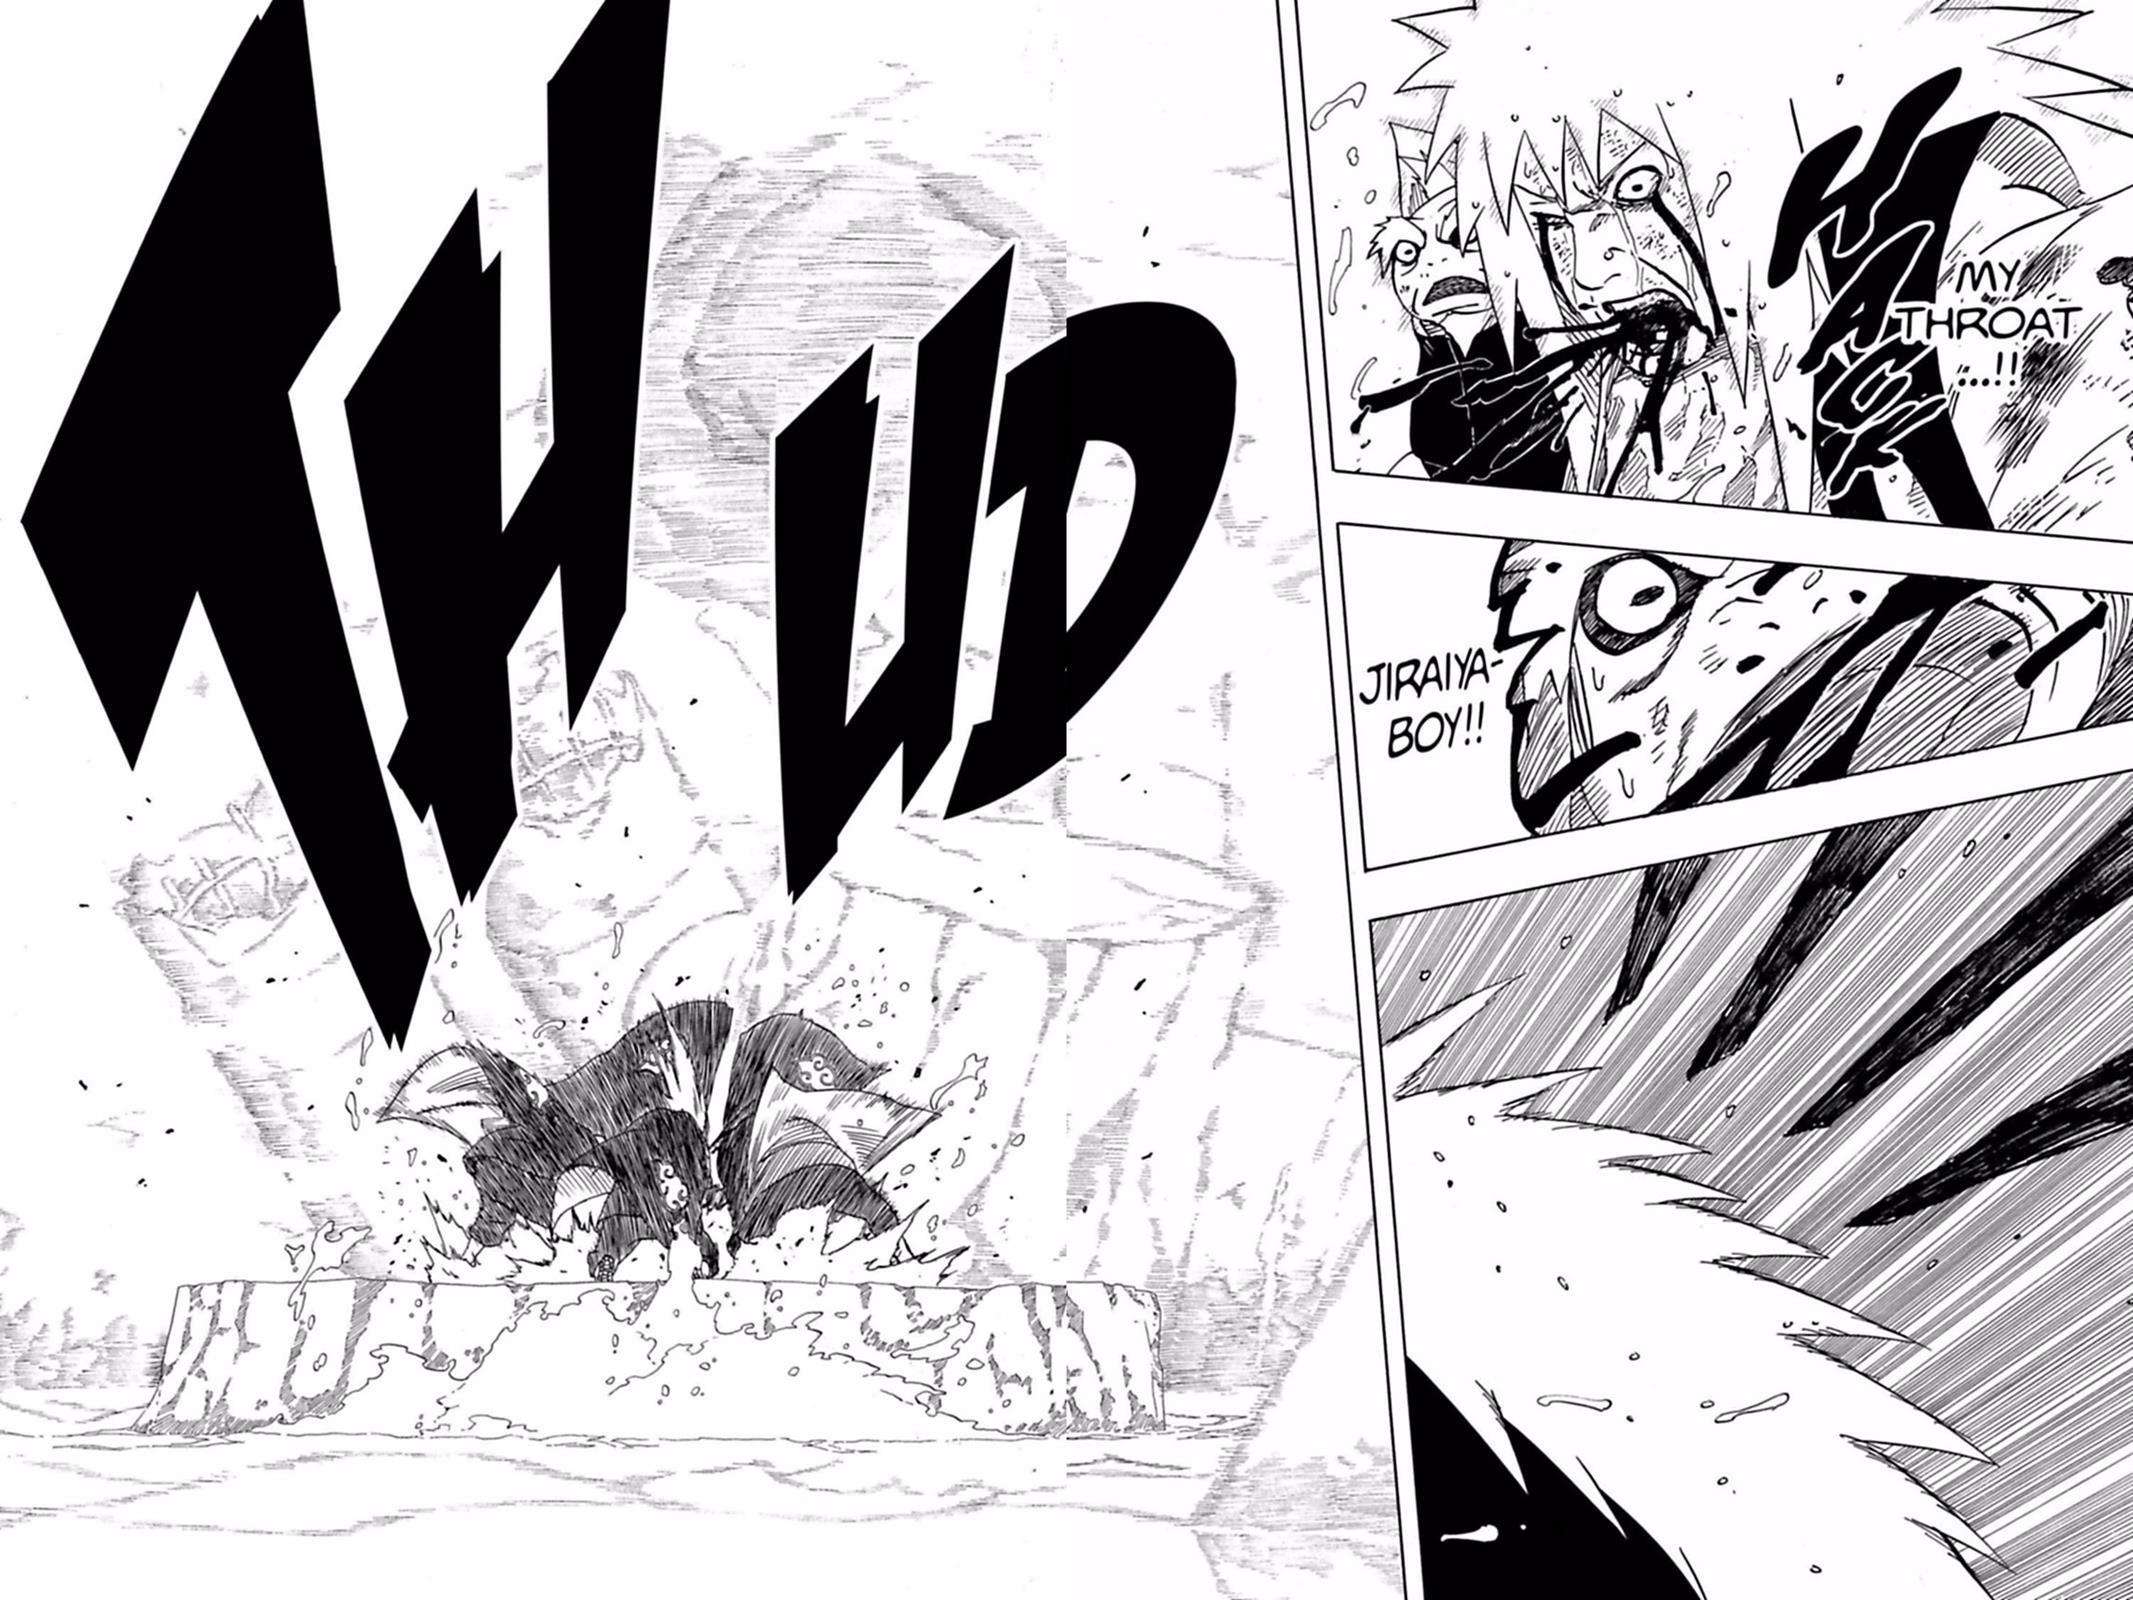 Hiruzen No auge era superior a quase todos da Akatsuki ?? - Página 2 0381-016